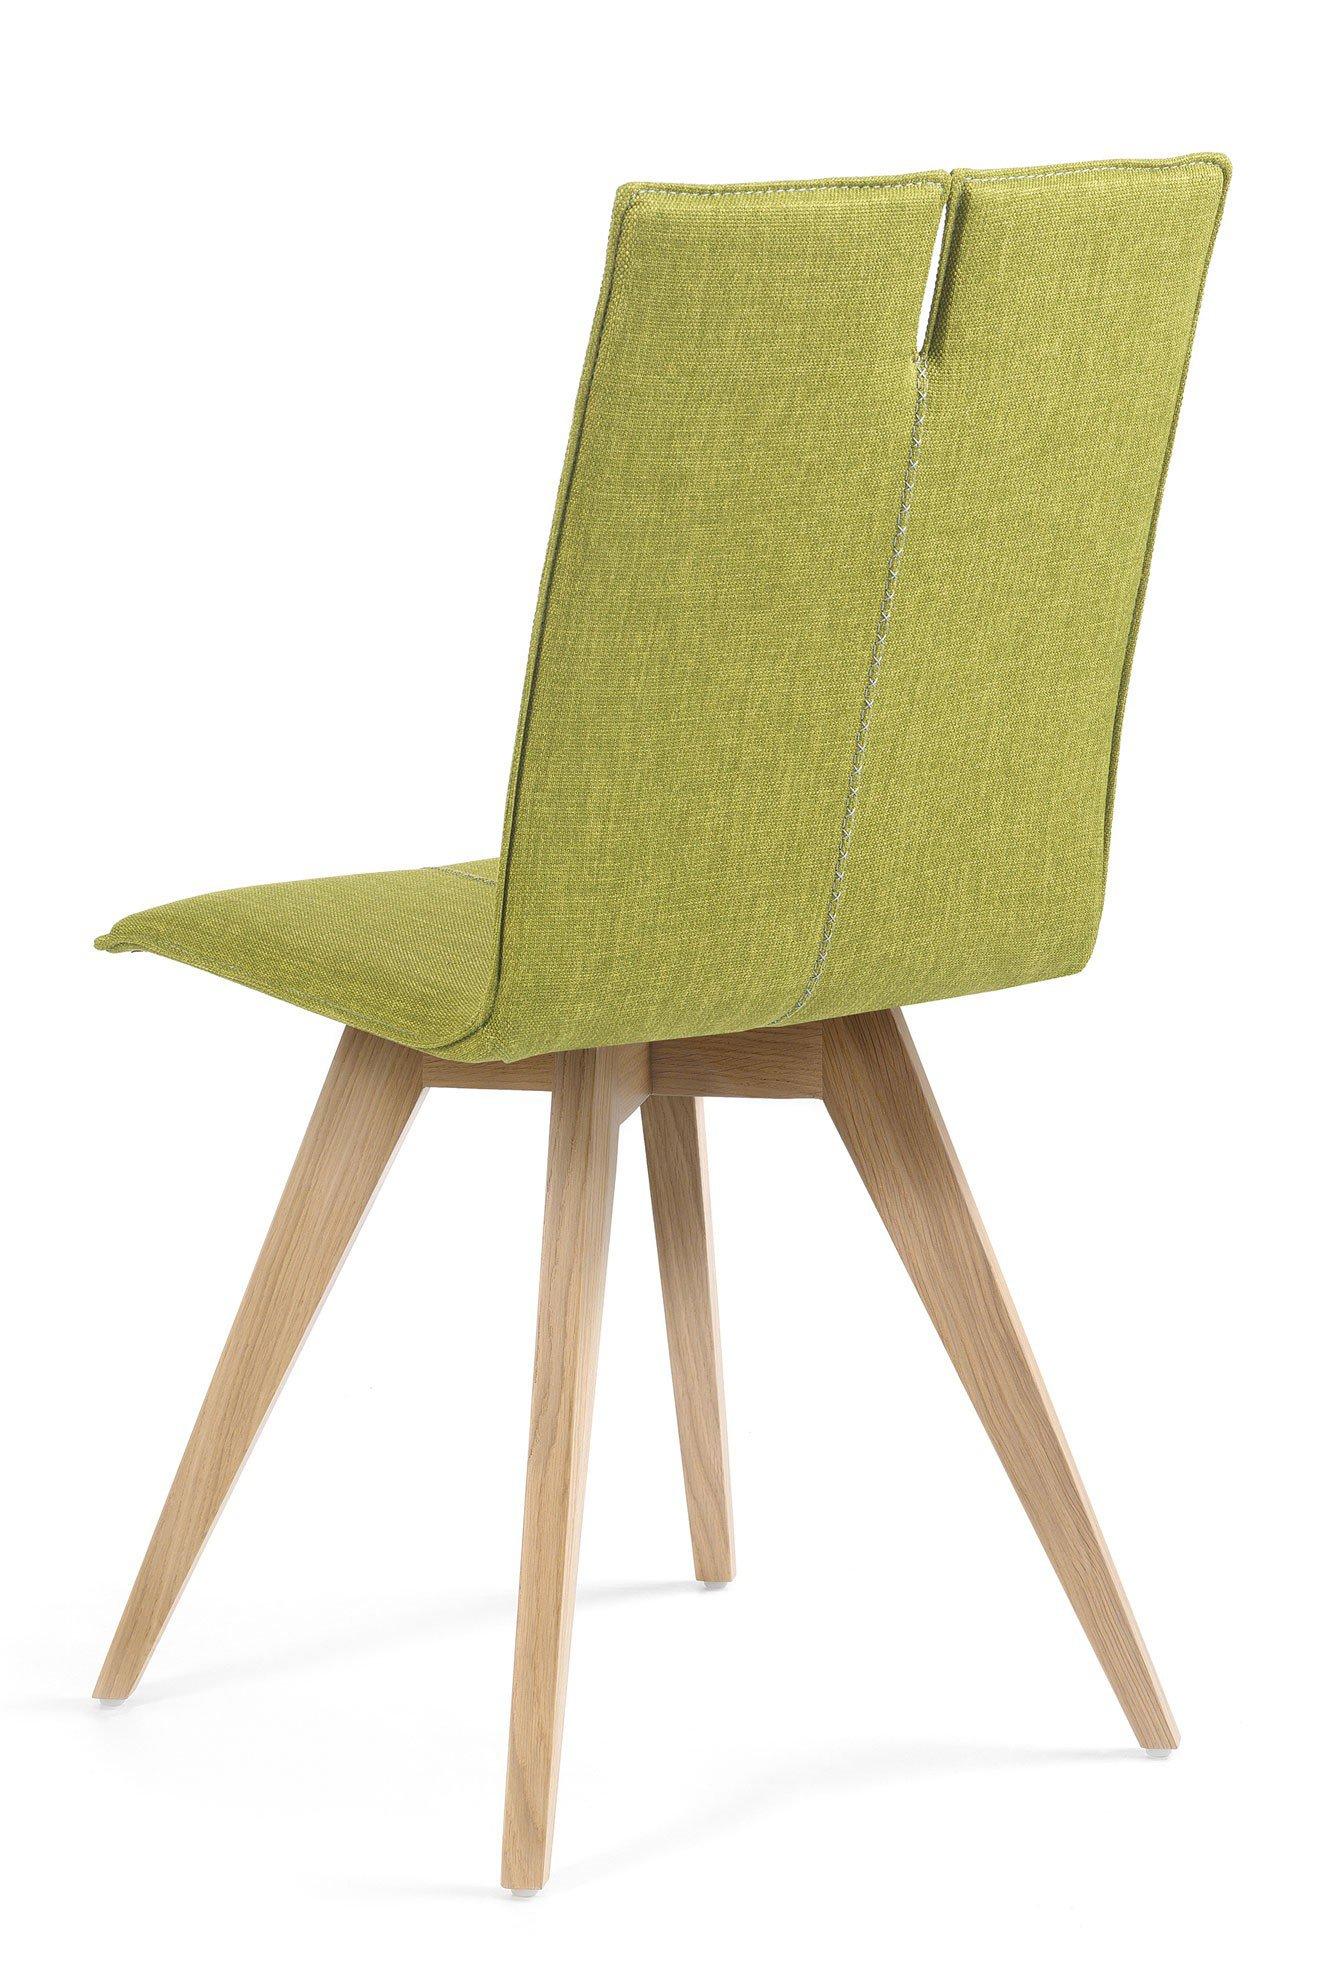 Stuhl Mood31 von Mobitec Eiche lime 2DYHI9EeW